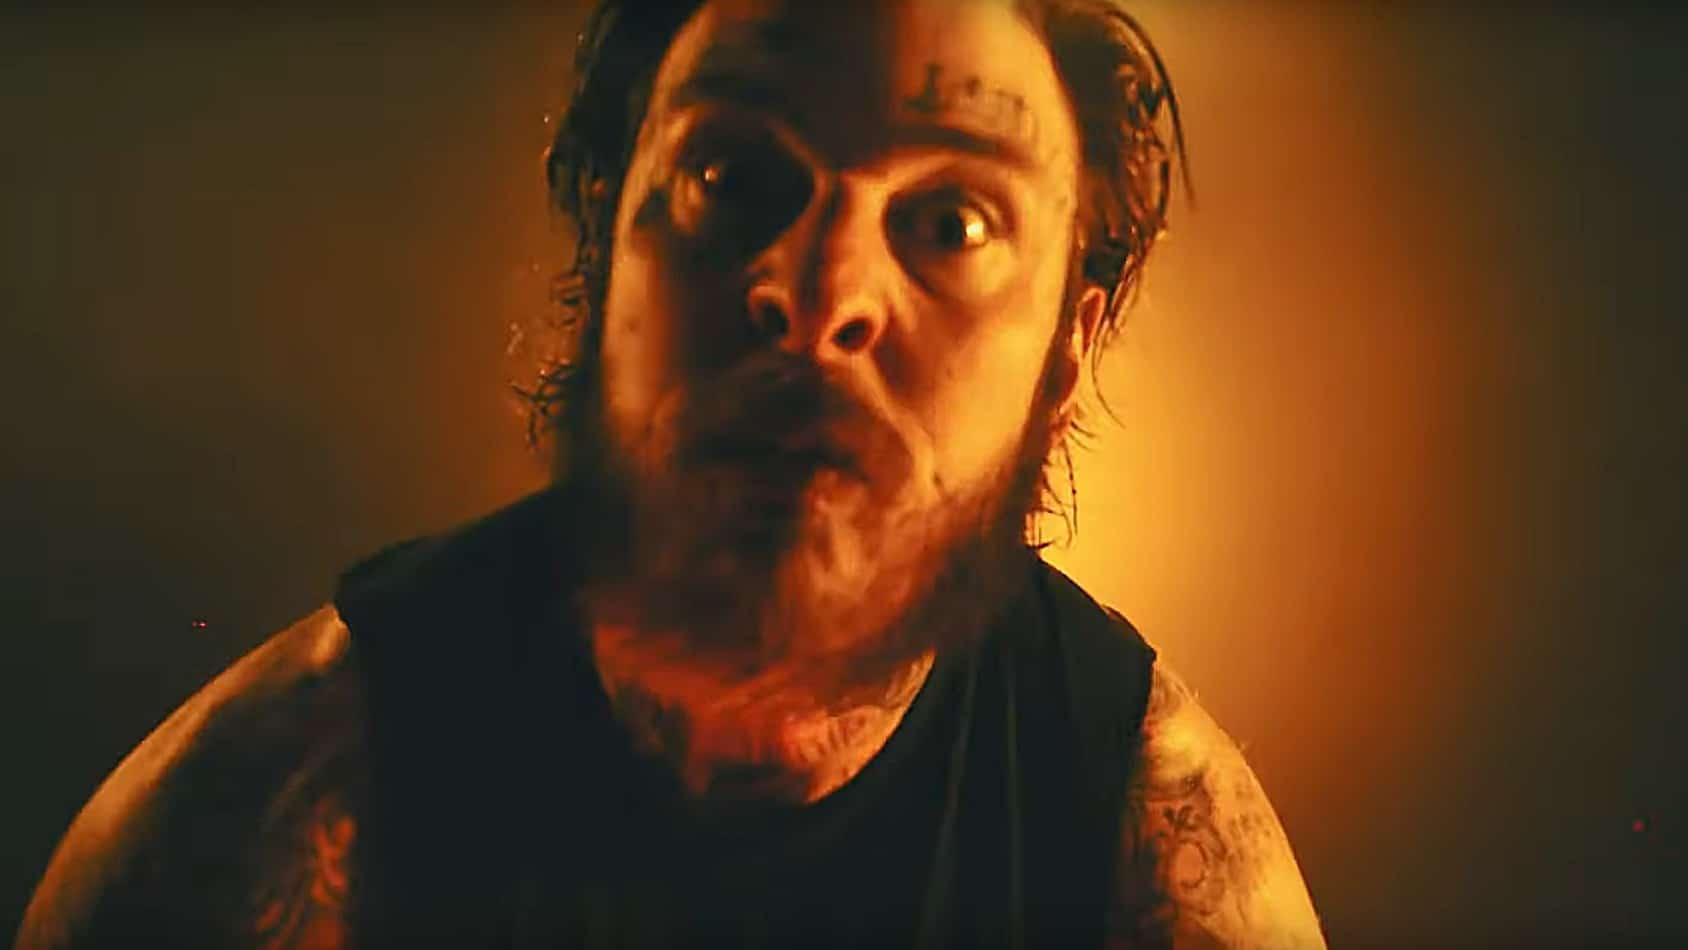 Ov Sulfur Tim Lambesis As I Lay Dying Ricky Hoover